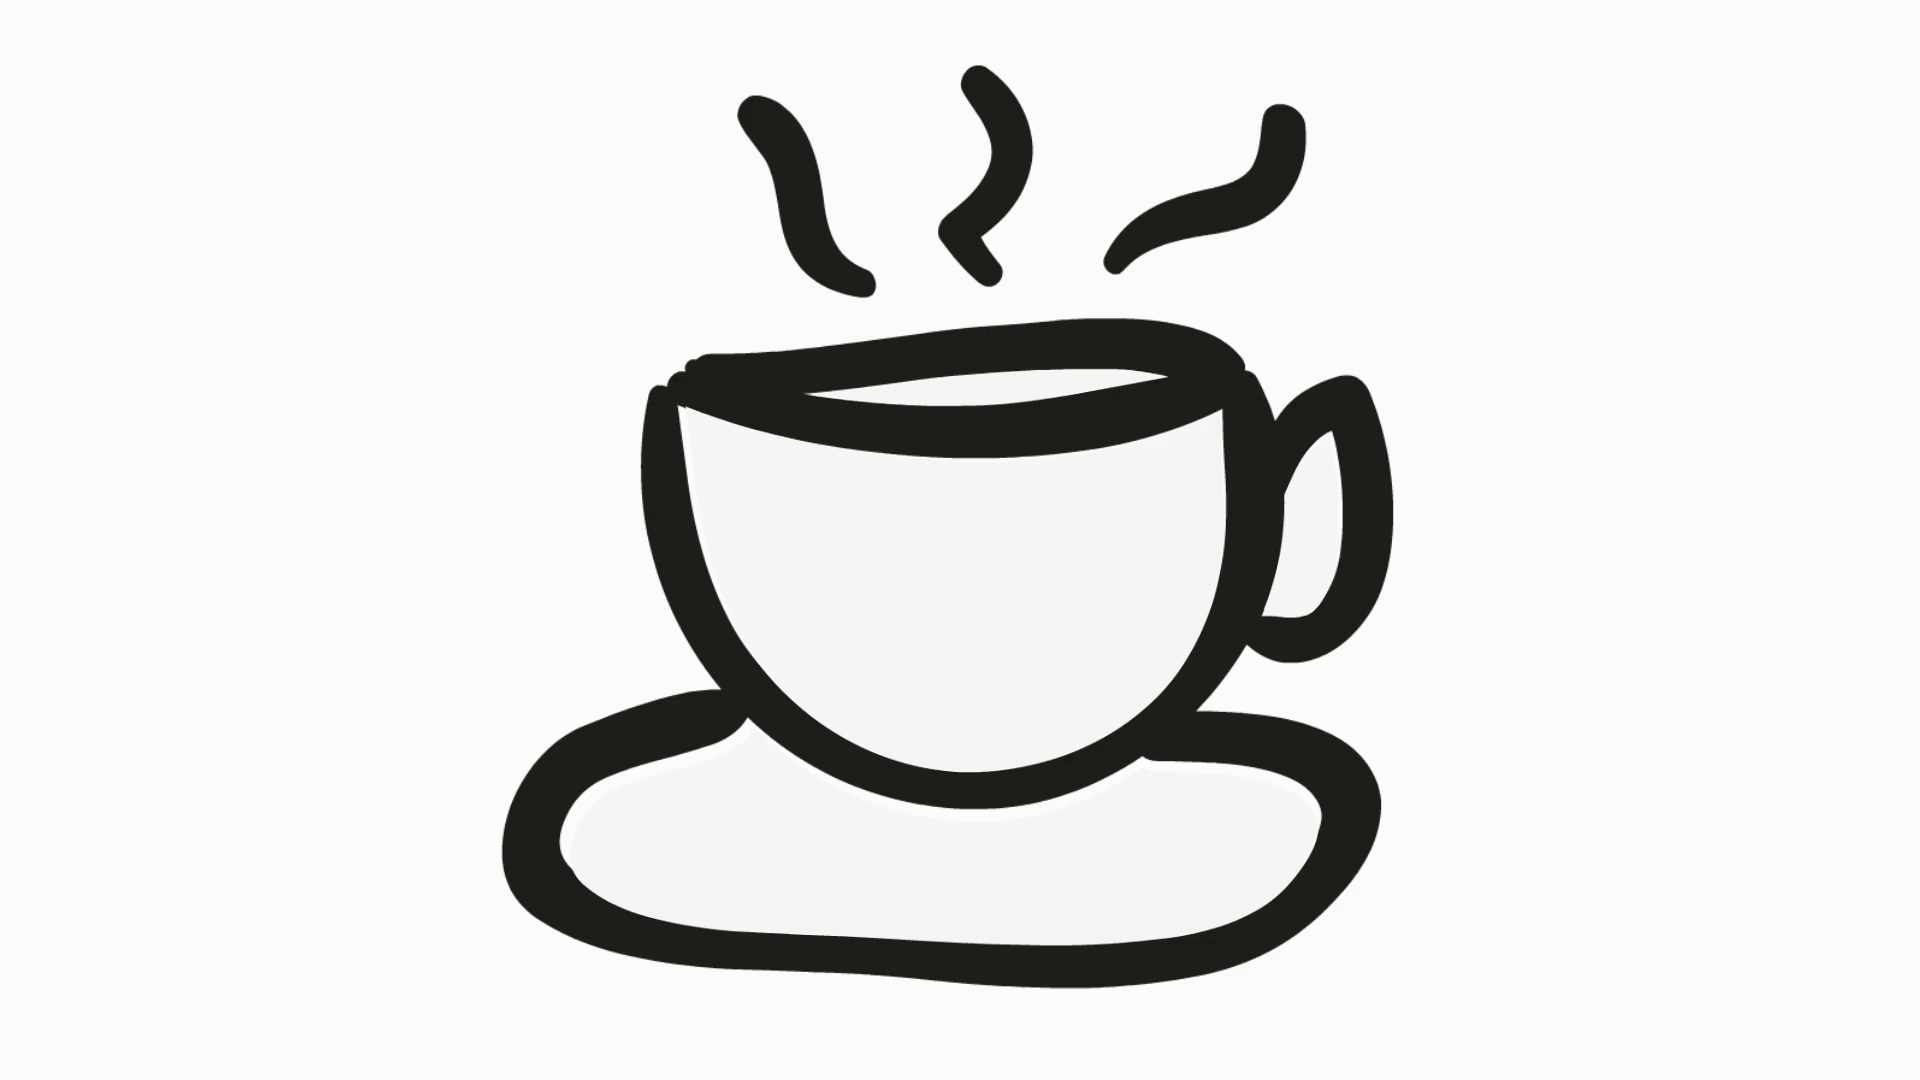 tea icon cartoon illustration hand drawn animation transparent motion background storyblocks tea icon cartoon illustration hand drawn animation transparent